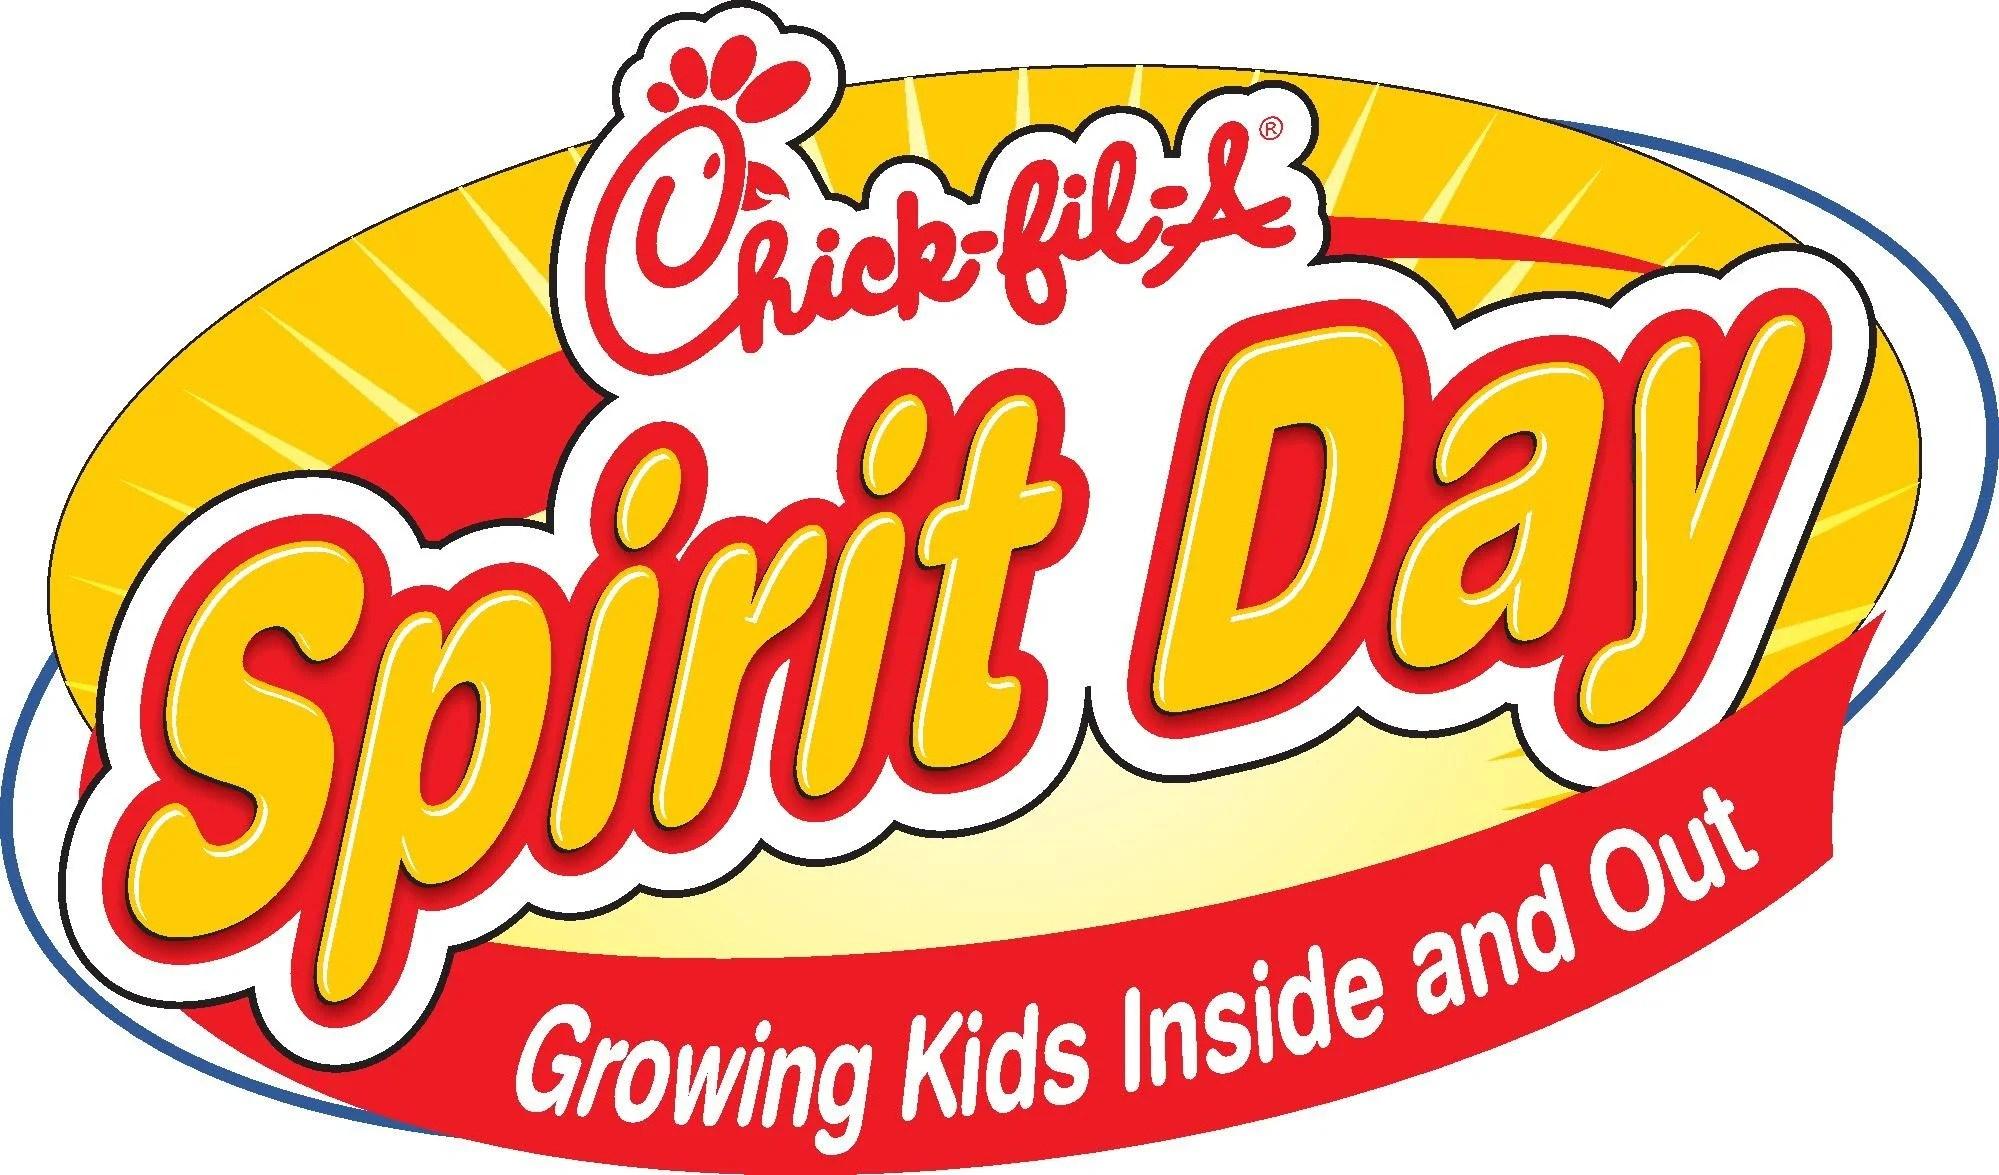 HCLS Spirit Day @ Chick Fil A